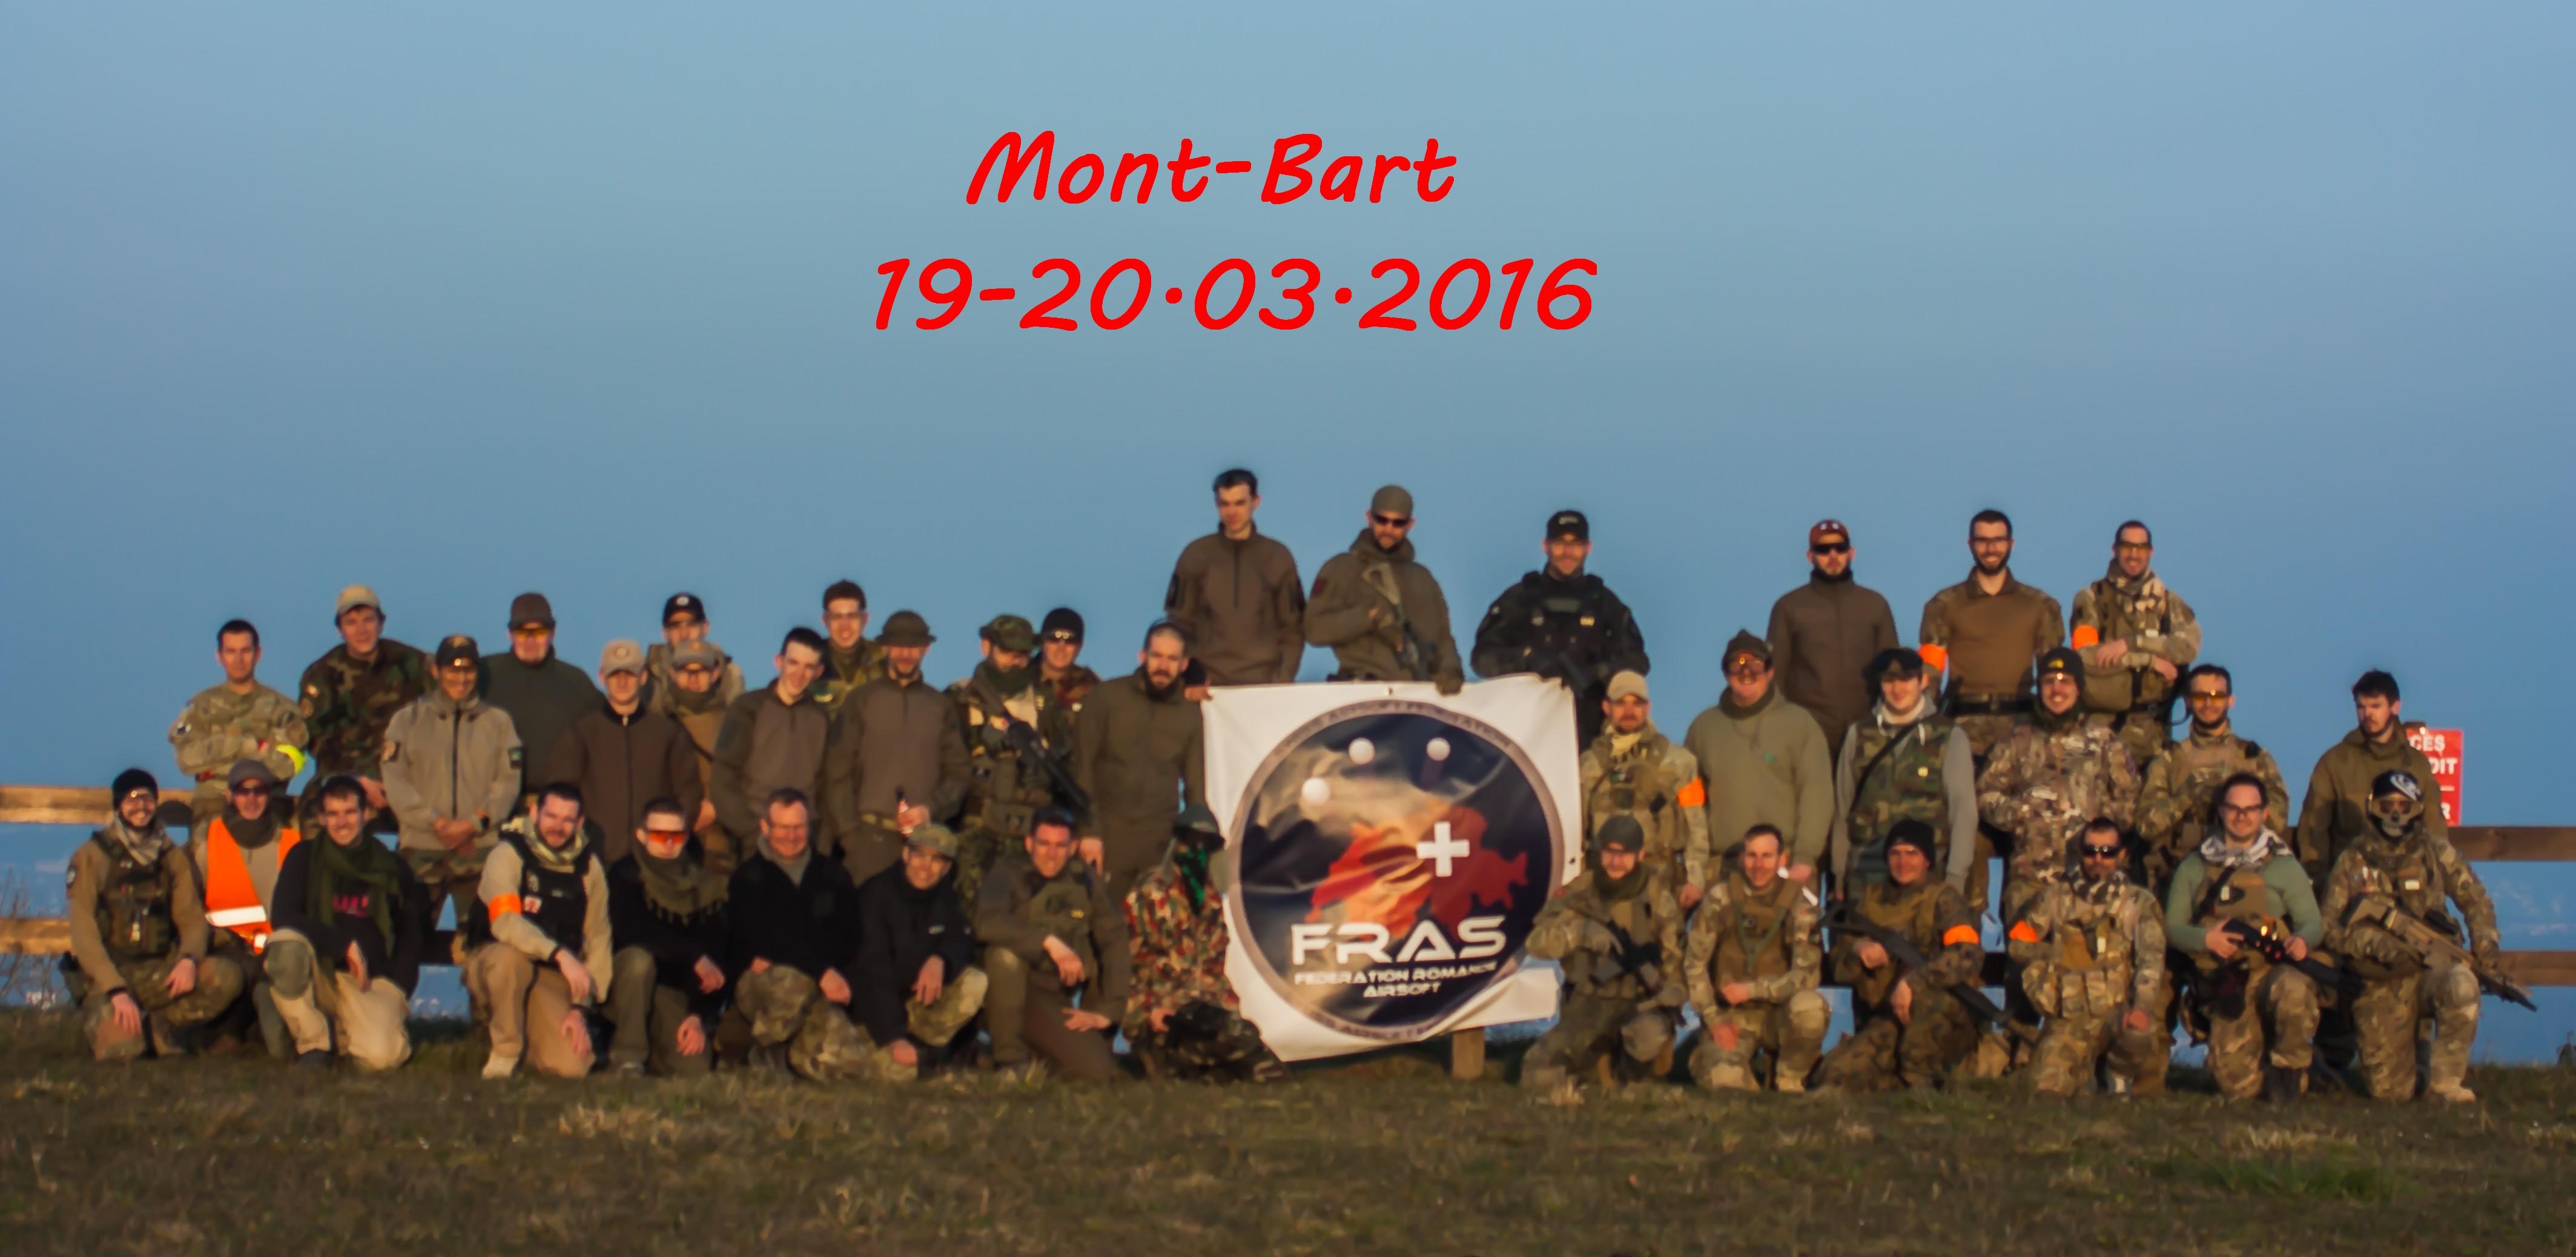 Mont-Bart